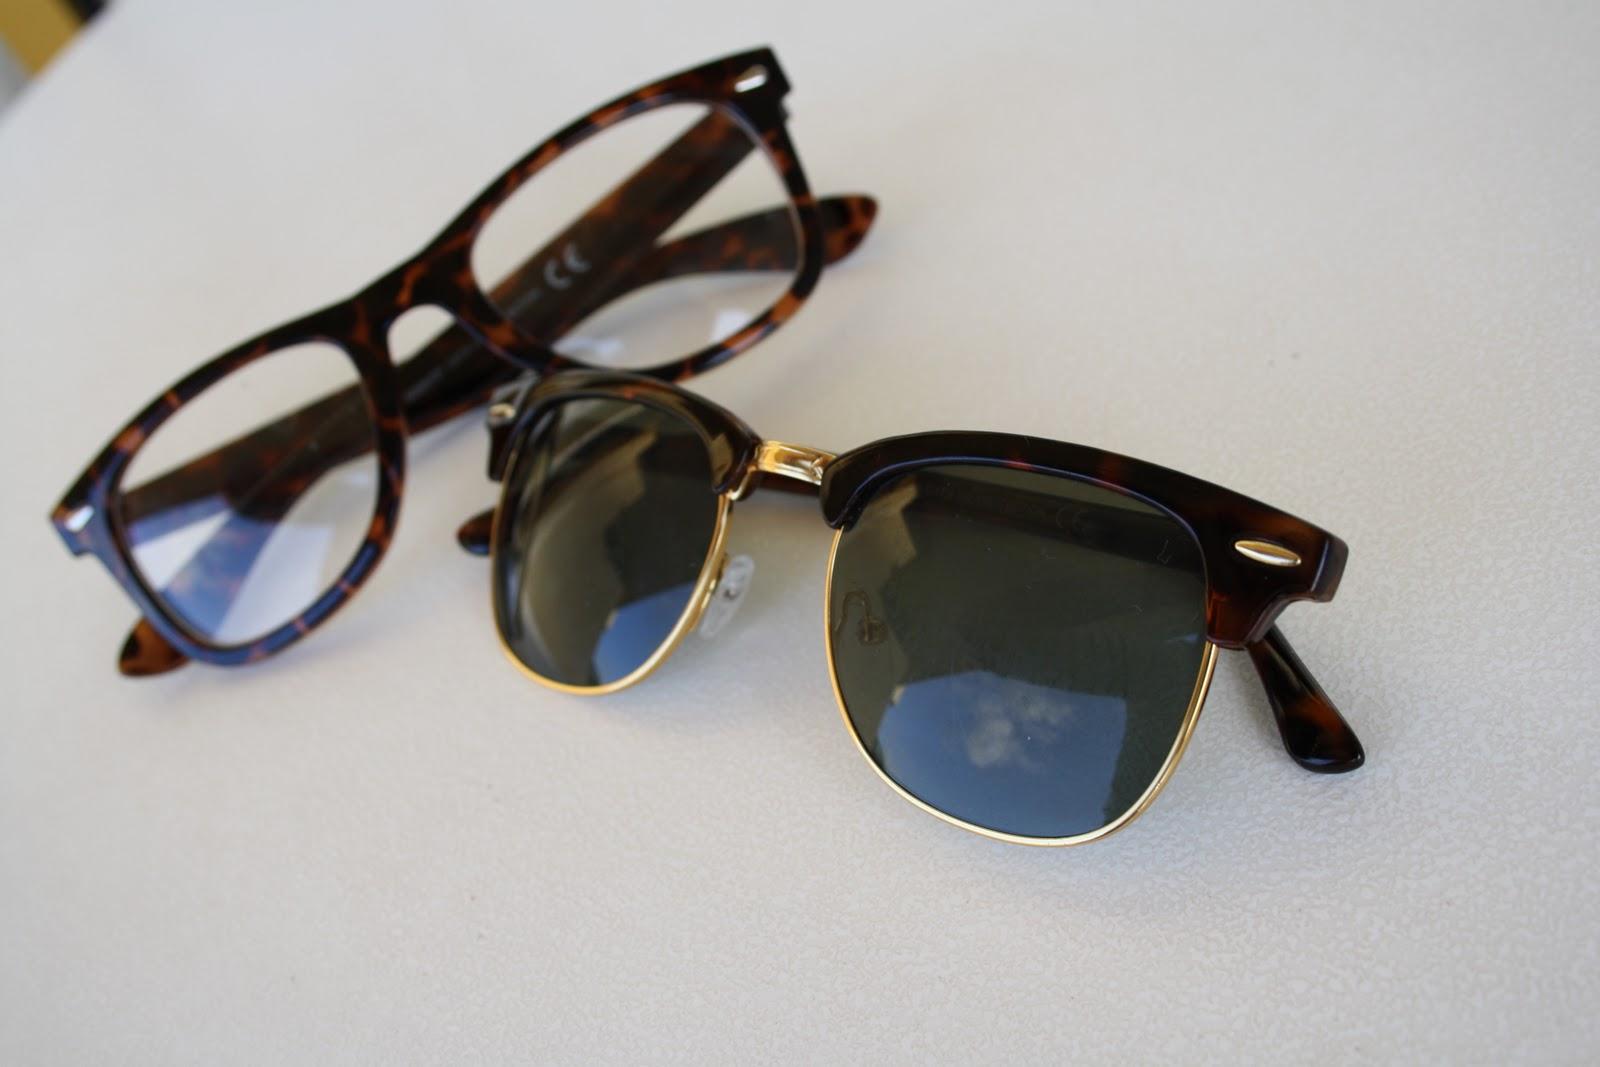 82f32fca75 Ray Ban Geek Prescription Glasses « Heritage Malta